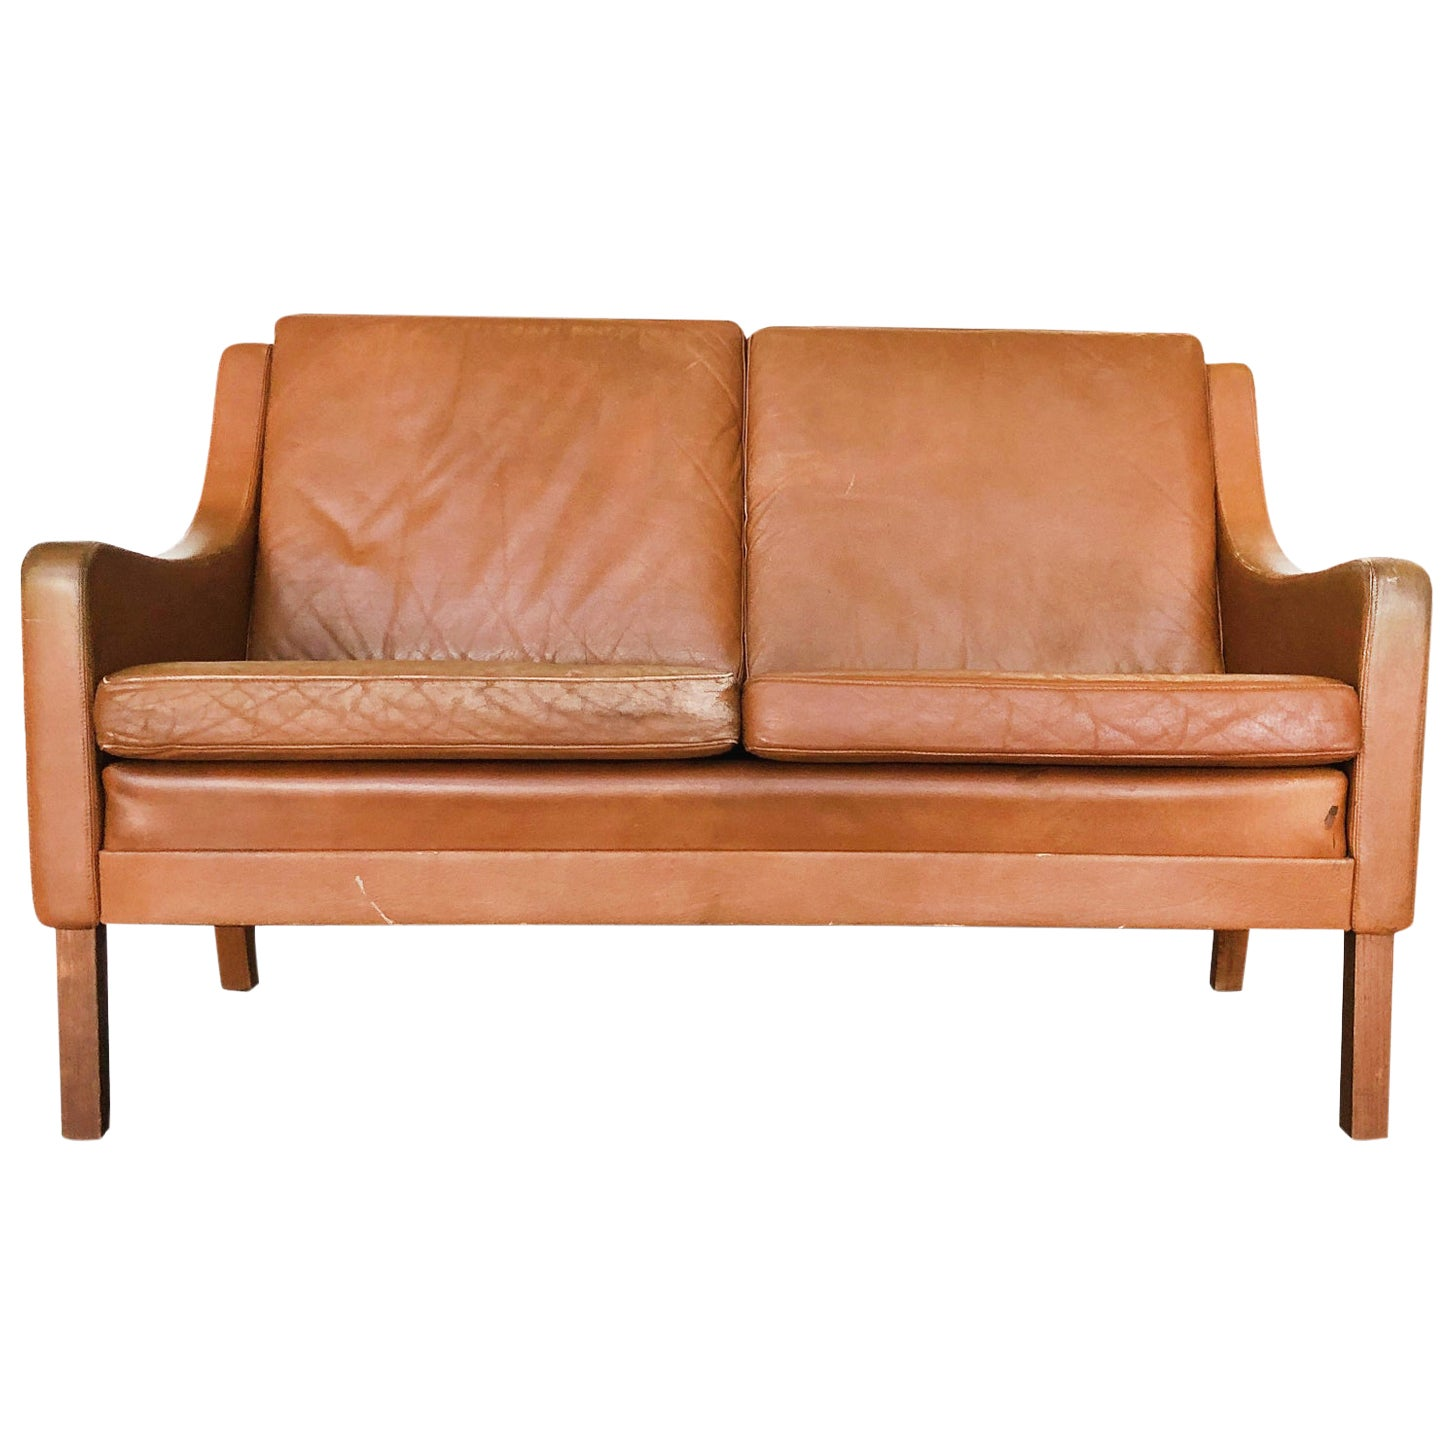 Danish Modern Leather Settee in the Style of Børge Mogensen